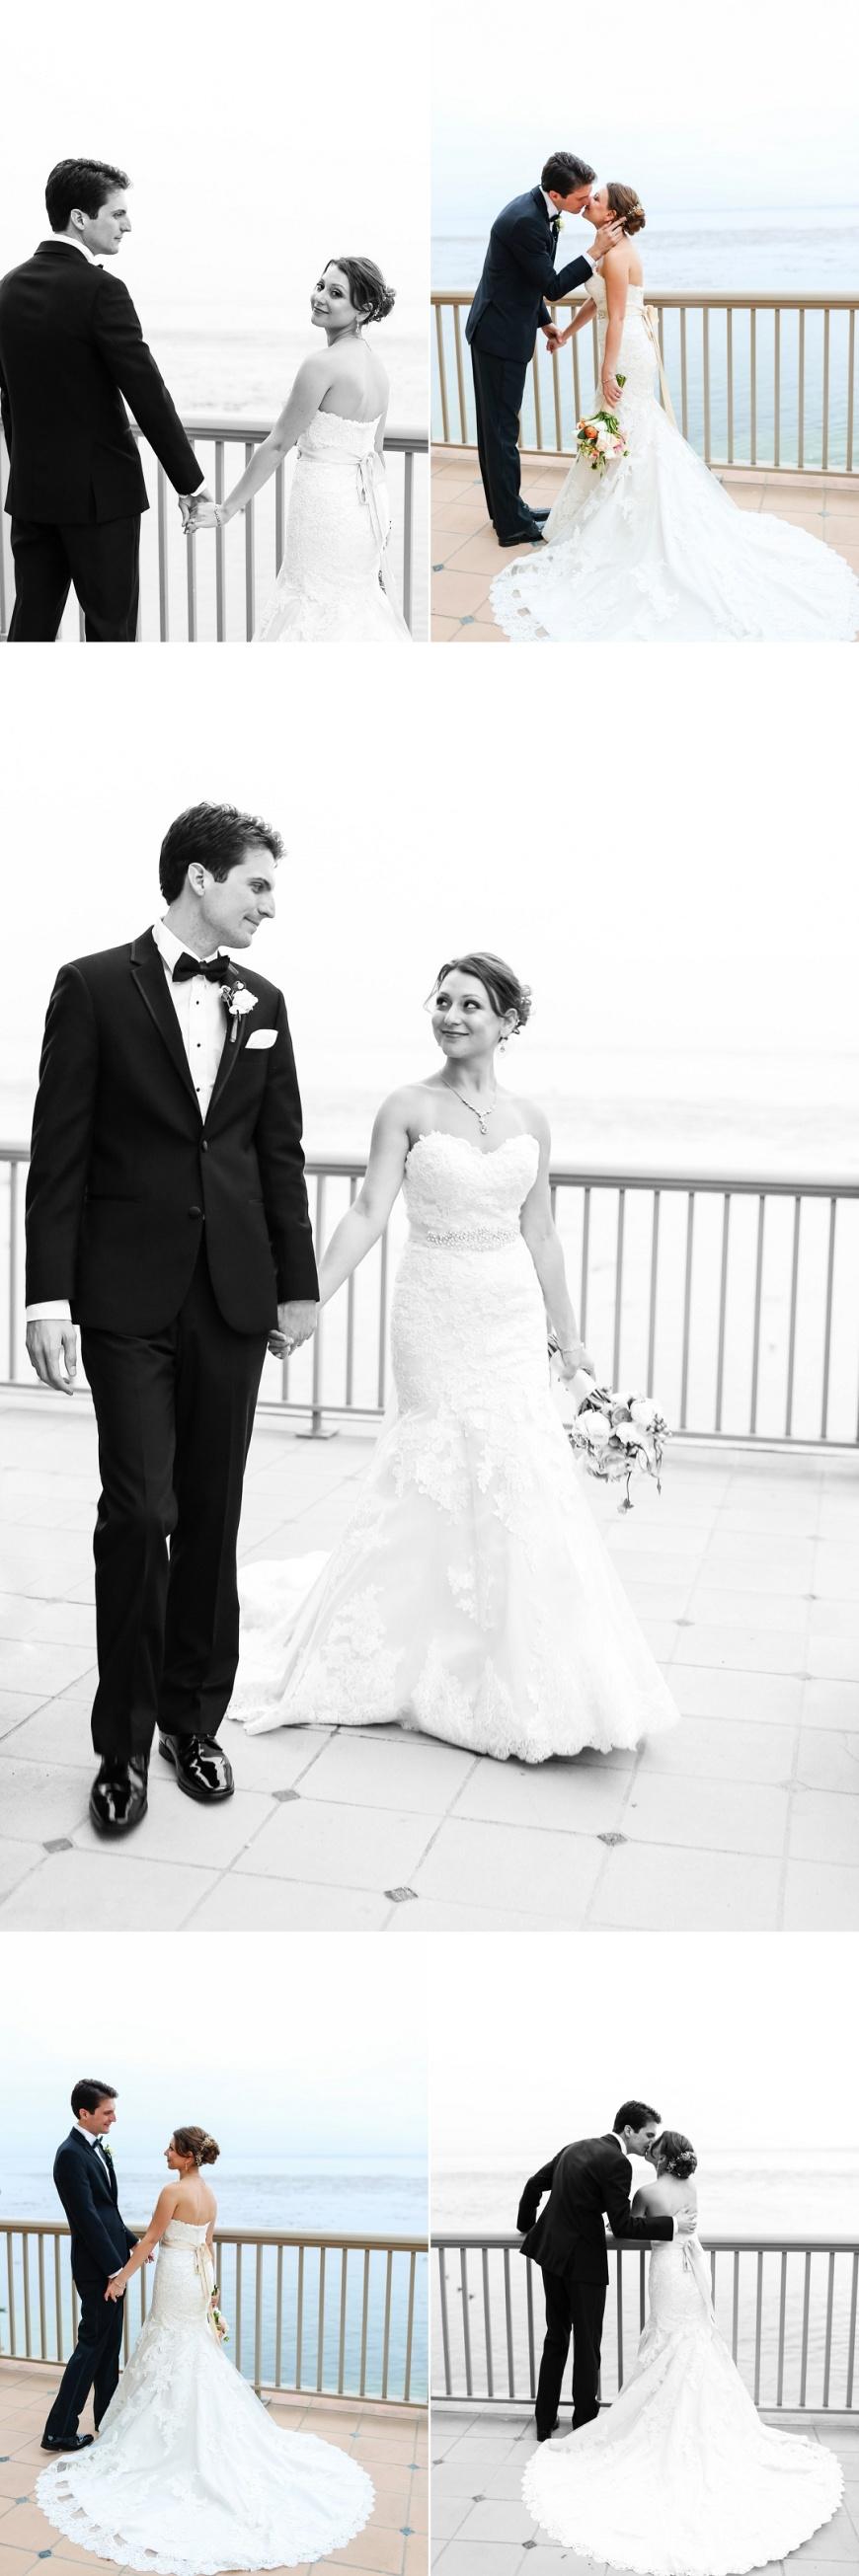 Monterey-Plaza-Hotel-Wedding-Photographer_1060.jpg